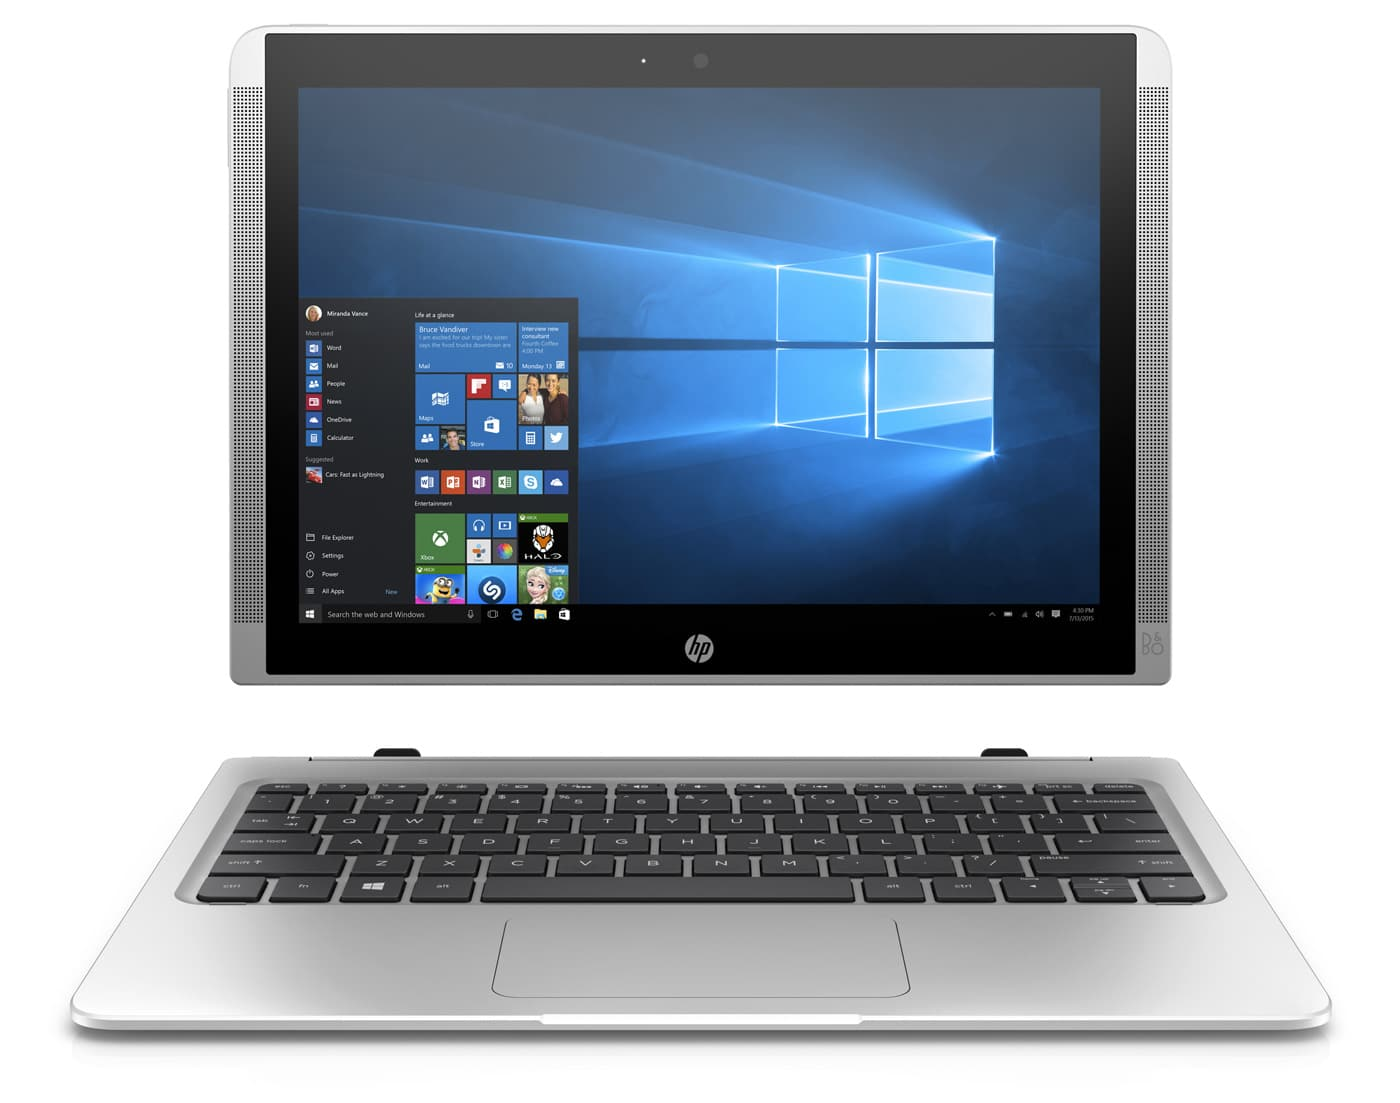 "<span class=""toptagtitre"">Promo ! </span>HP Pavilion x2 12-b101nf, tablette 12"" avec dock SSD128 Full IPS à 499€"